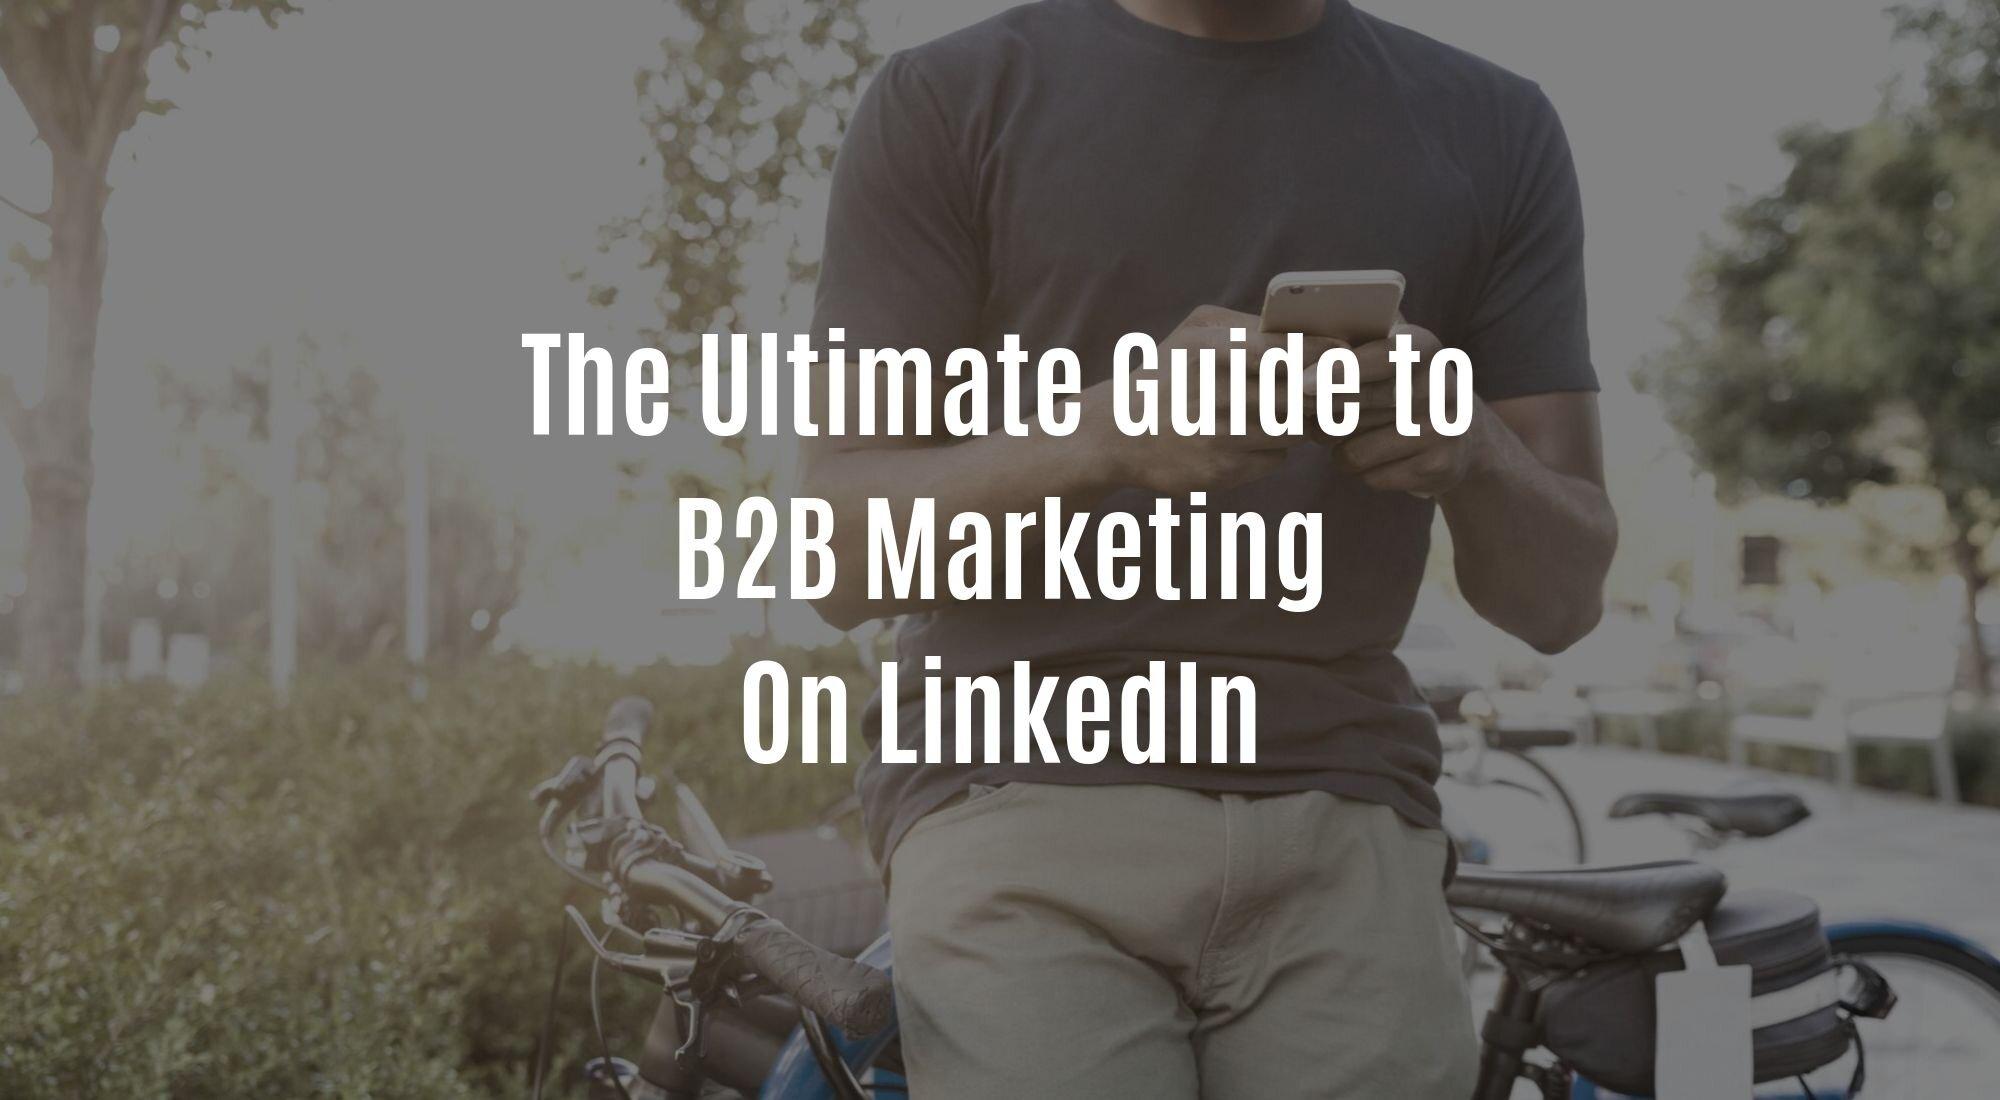 The Ultimate Guide to B2B Marketing On LinkedIn.jpg